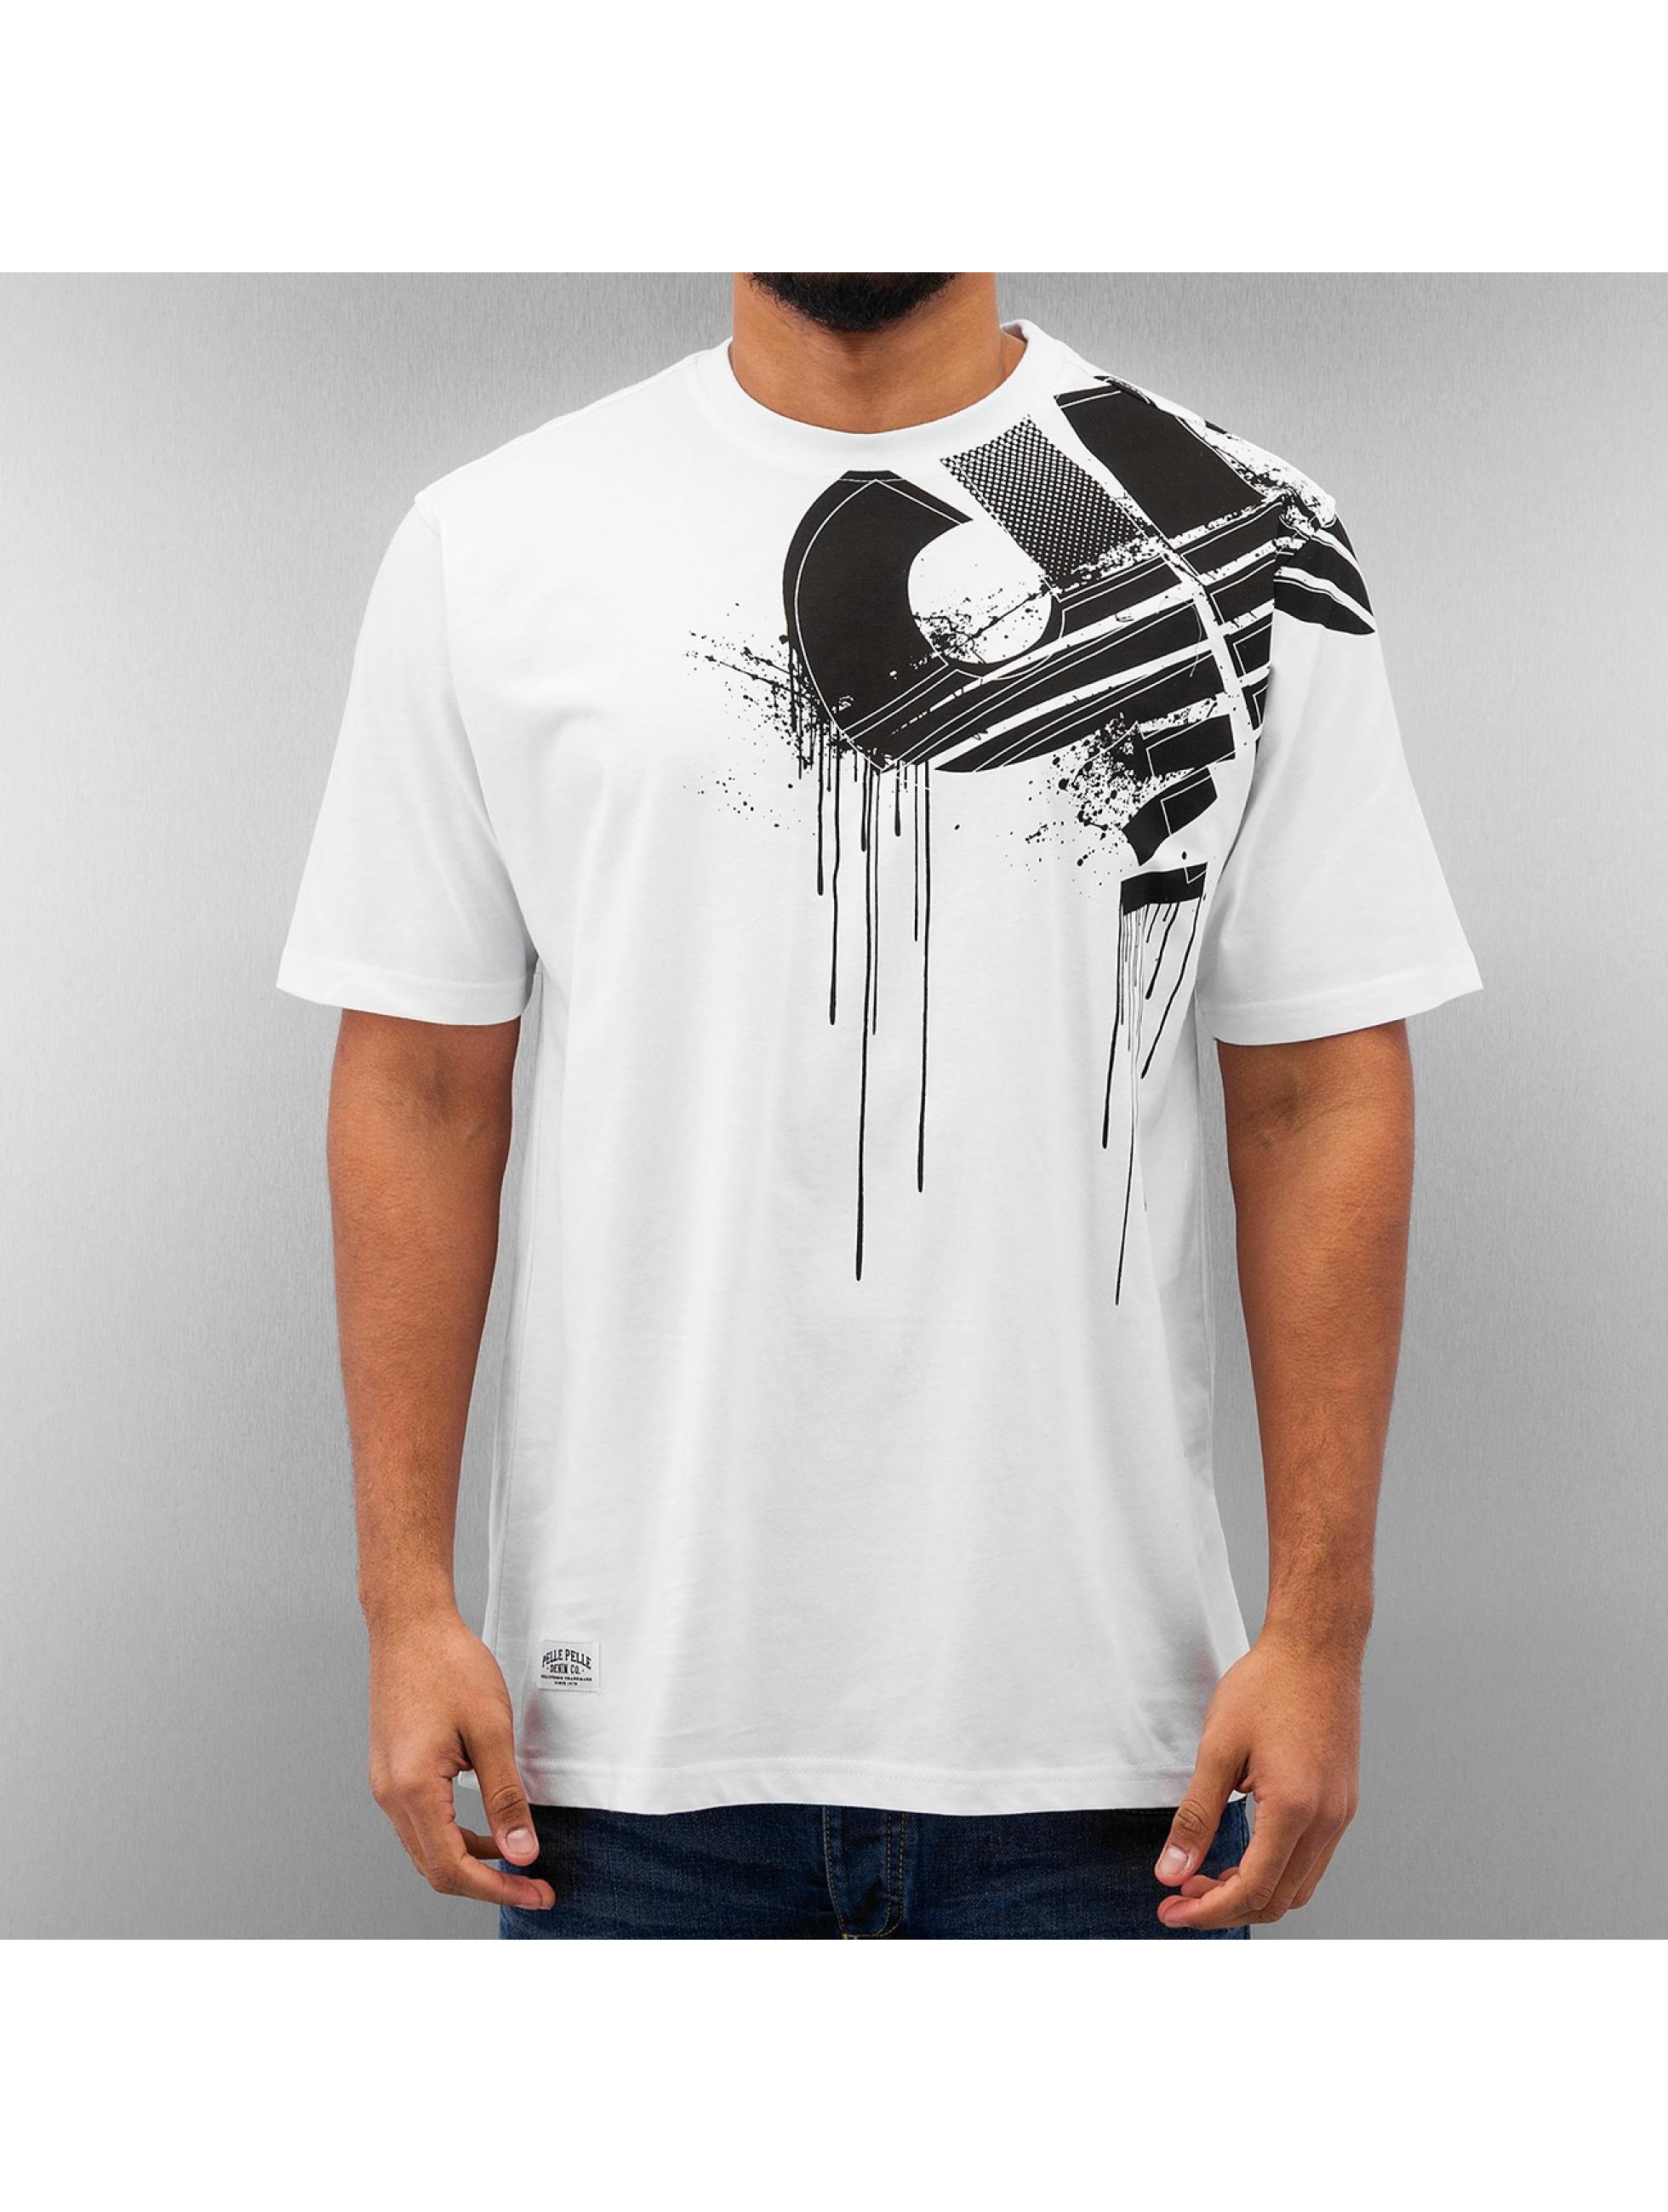 Pelle Pelle T-Shirt Demolition weiß